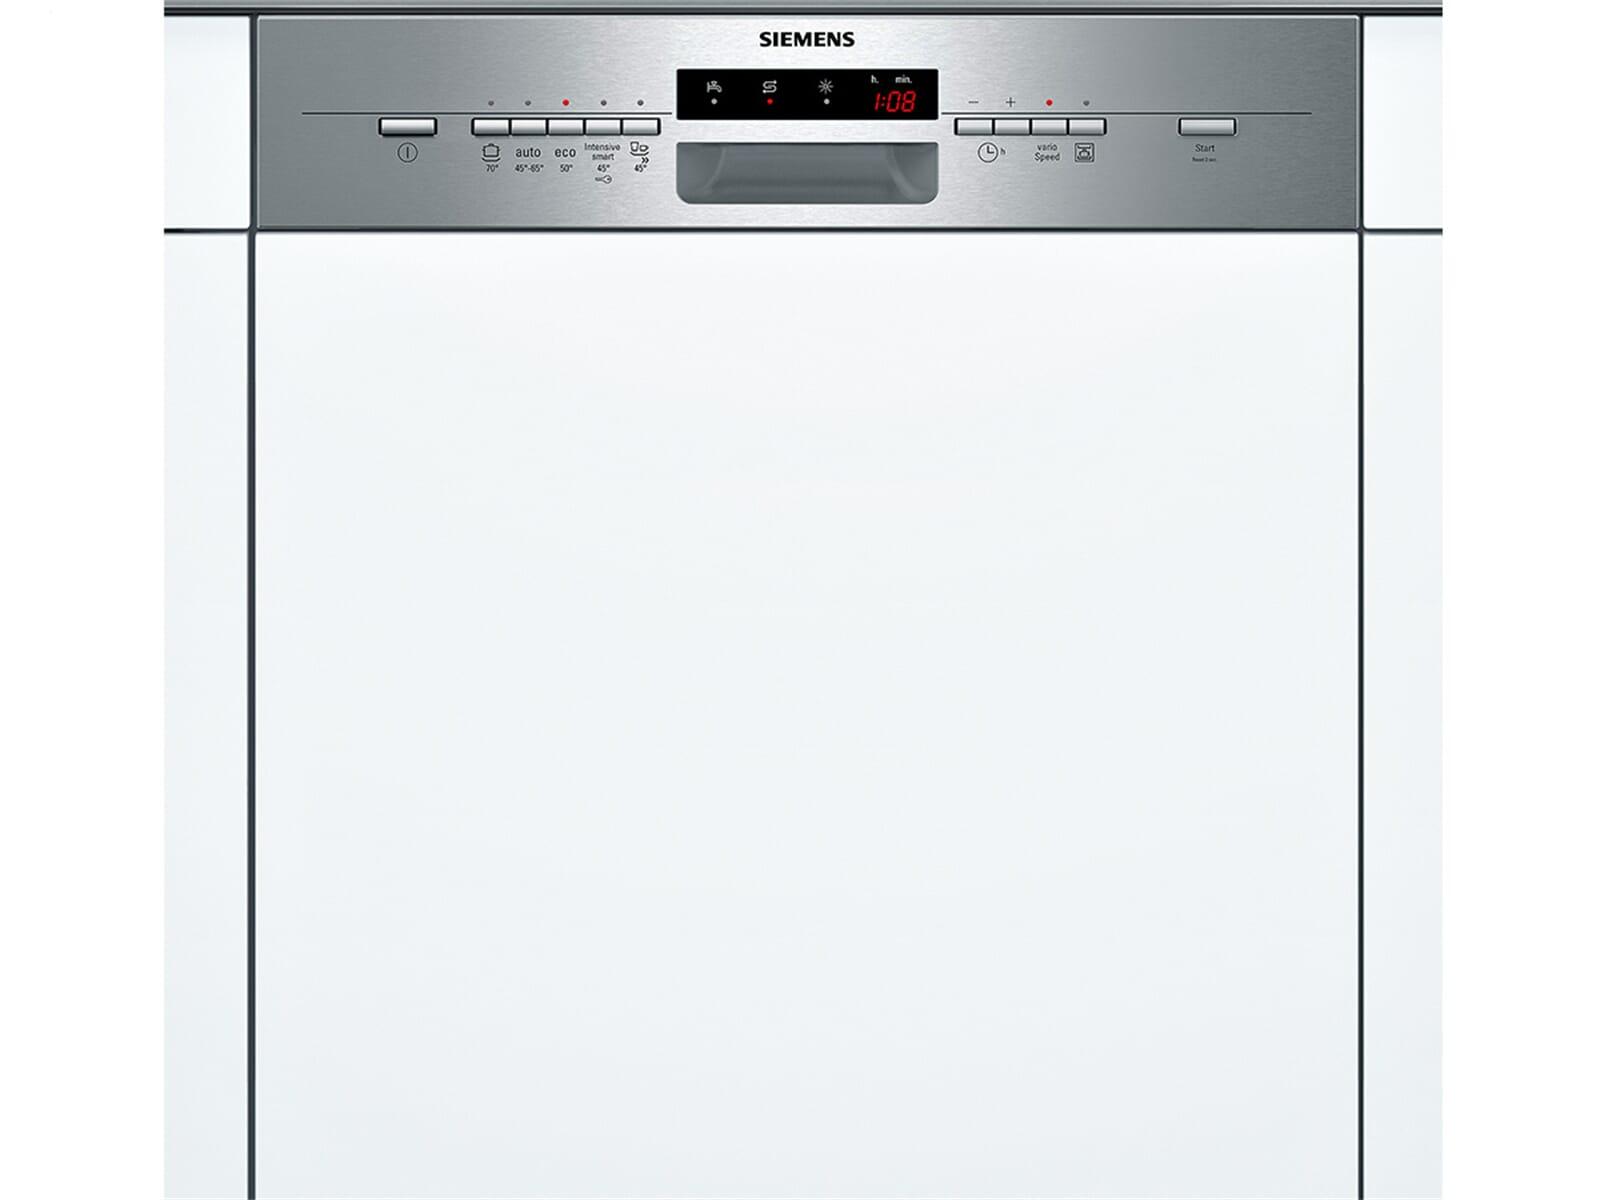 Geschirrspülmaschine Teilintegrierbar = siemens sn55l530eu teilintegrierbarer einbau